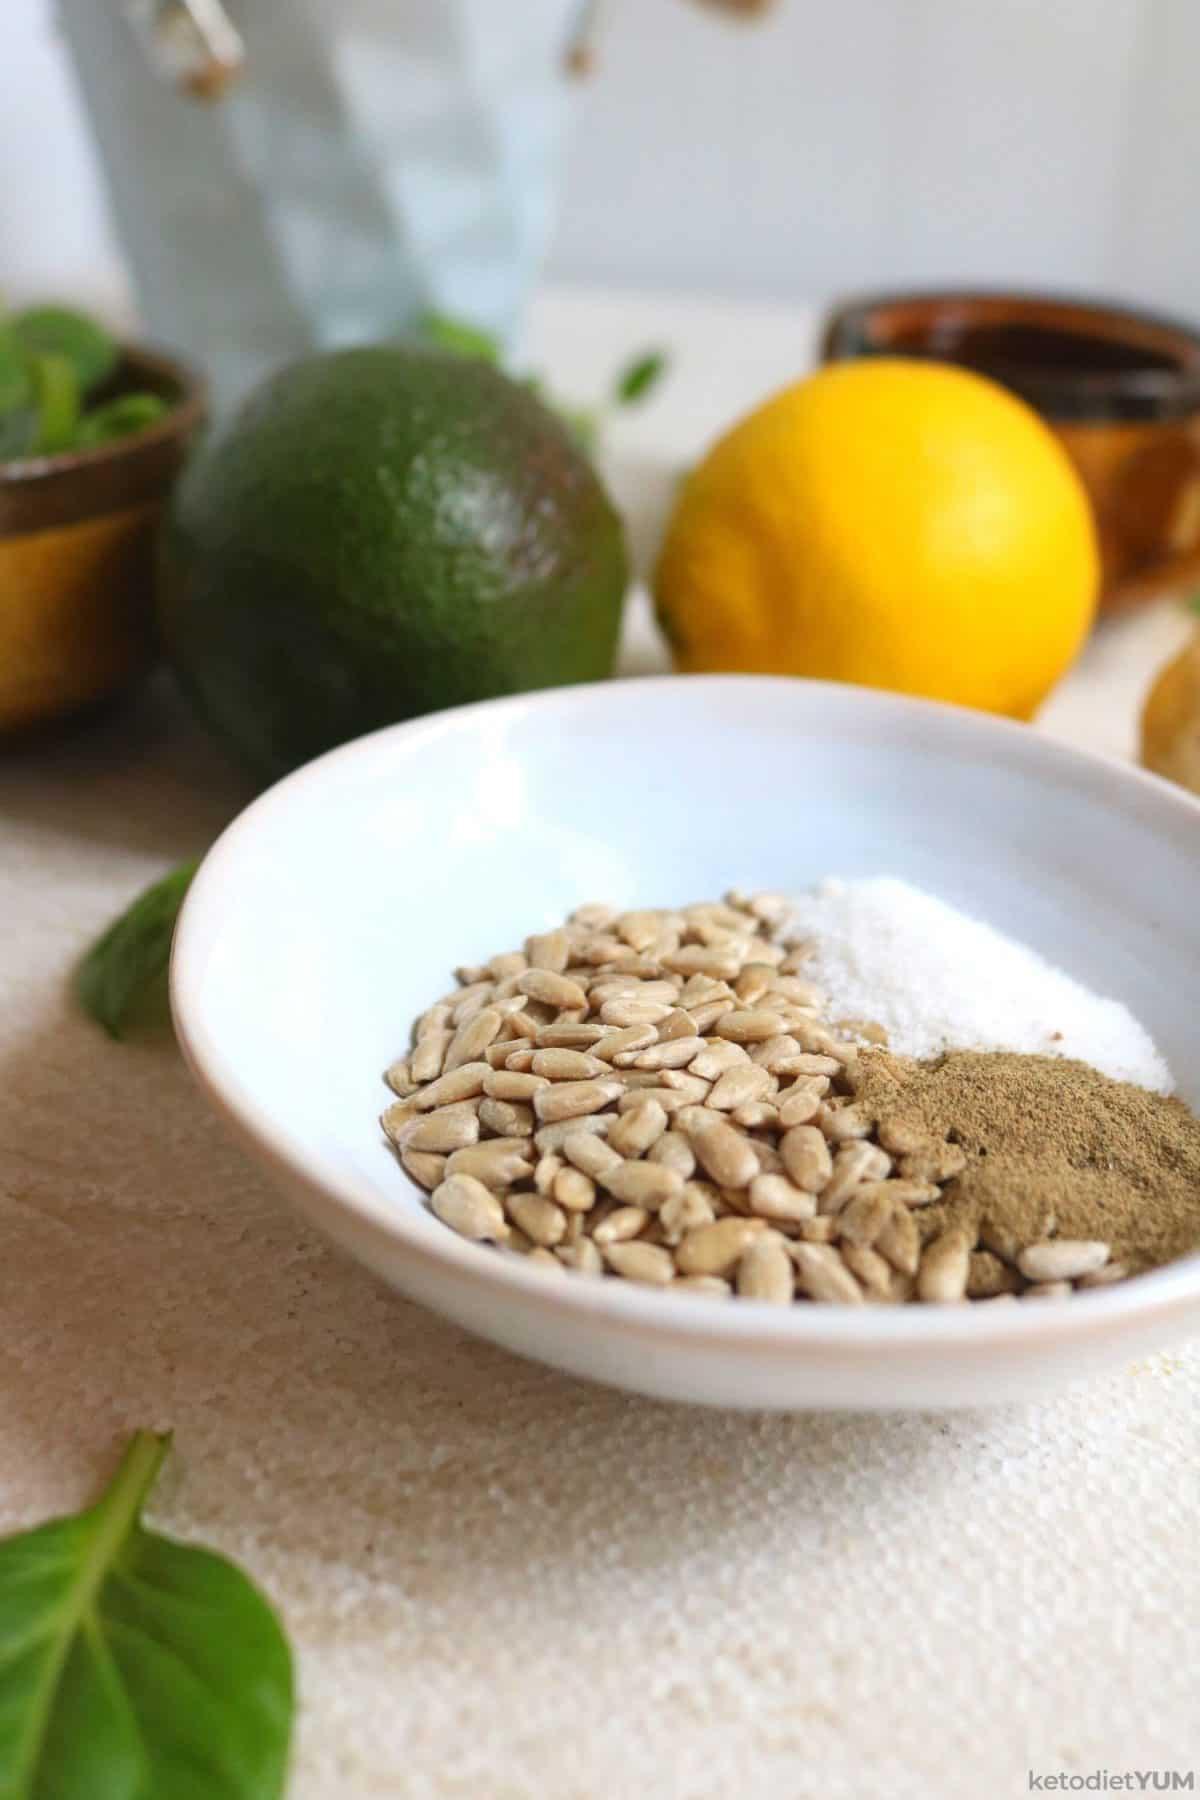 A bowl of sunflower seeds, salt and black pepper